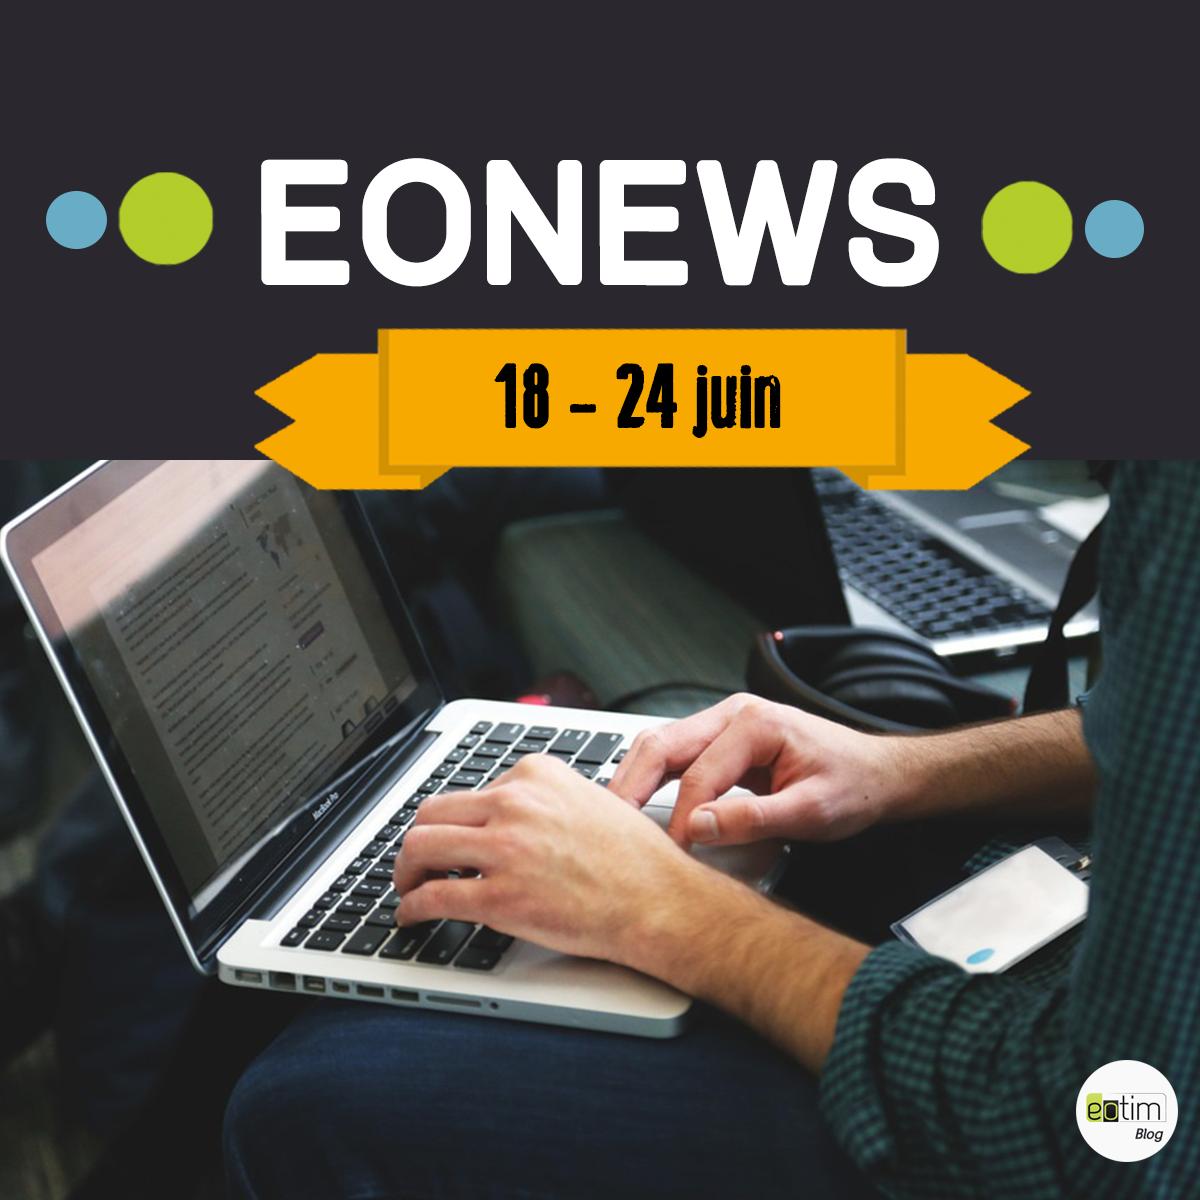 Eonews : l'essentiel de la semaine (18-24 juin)